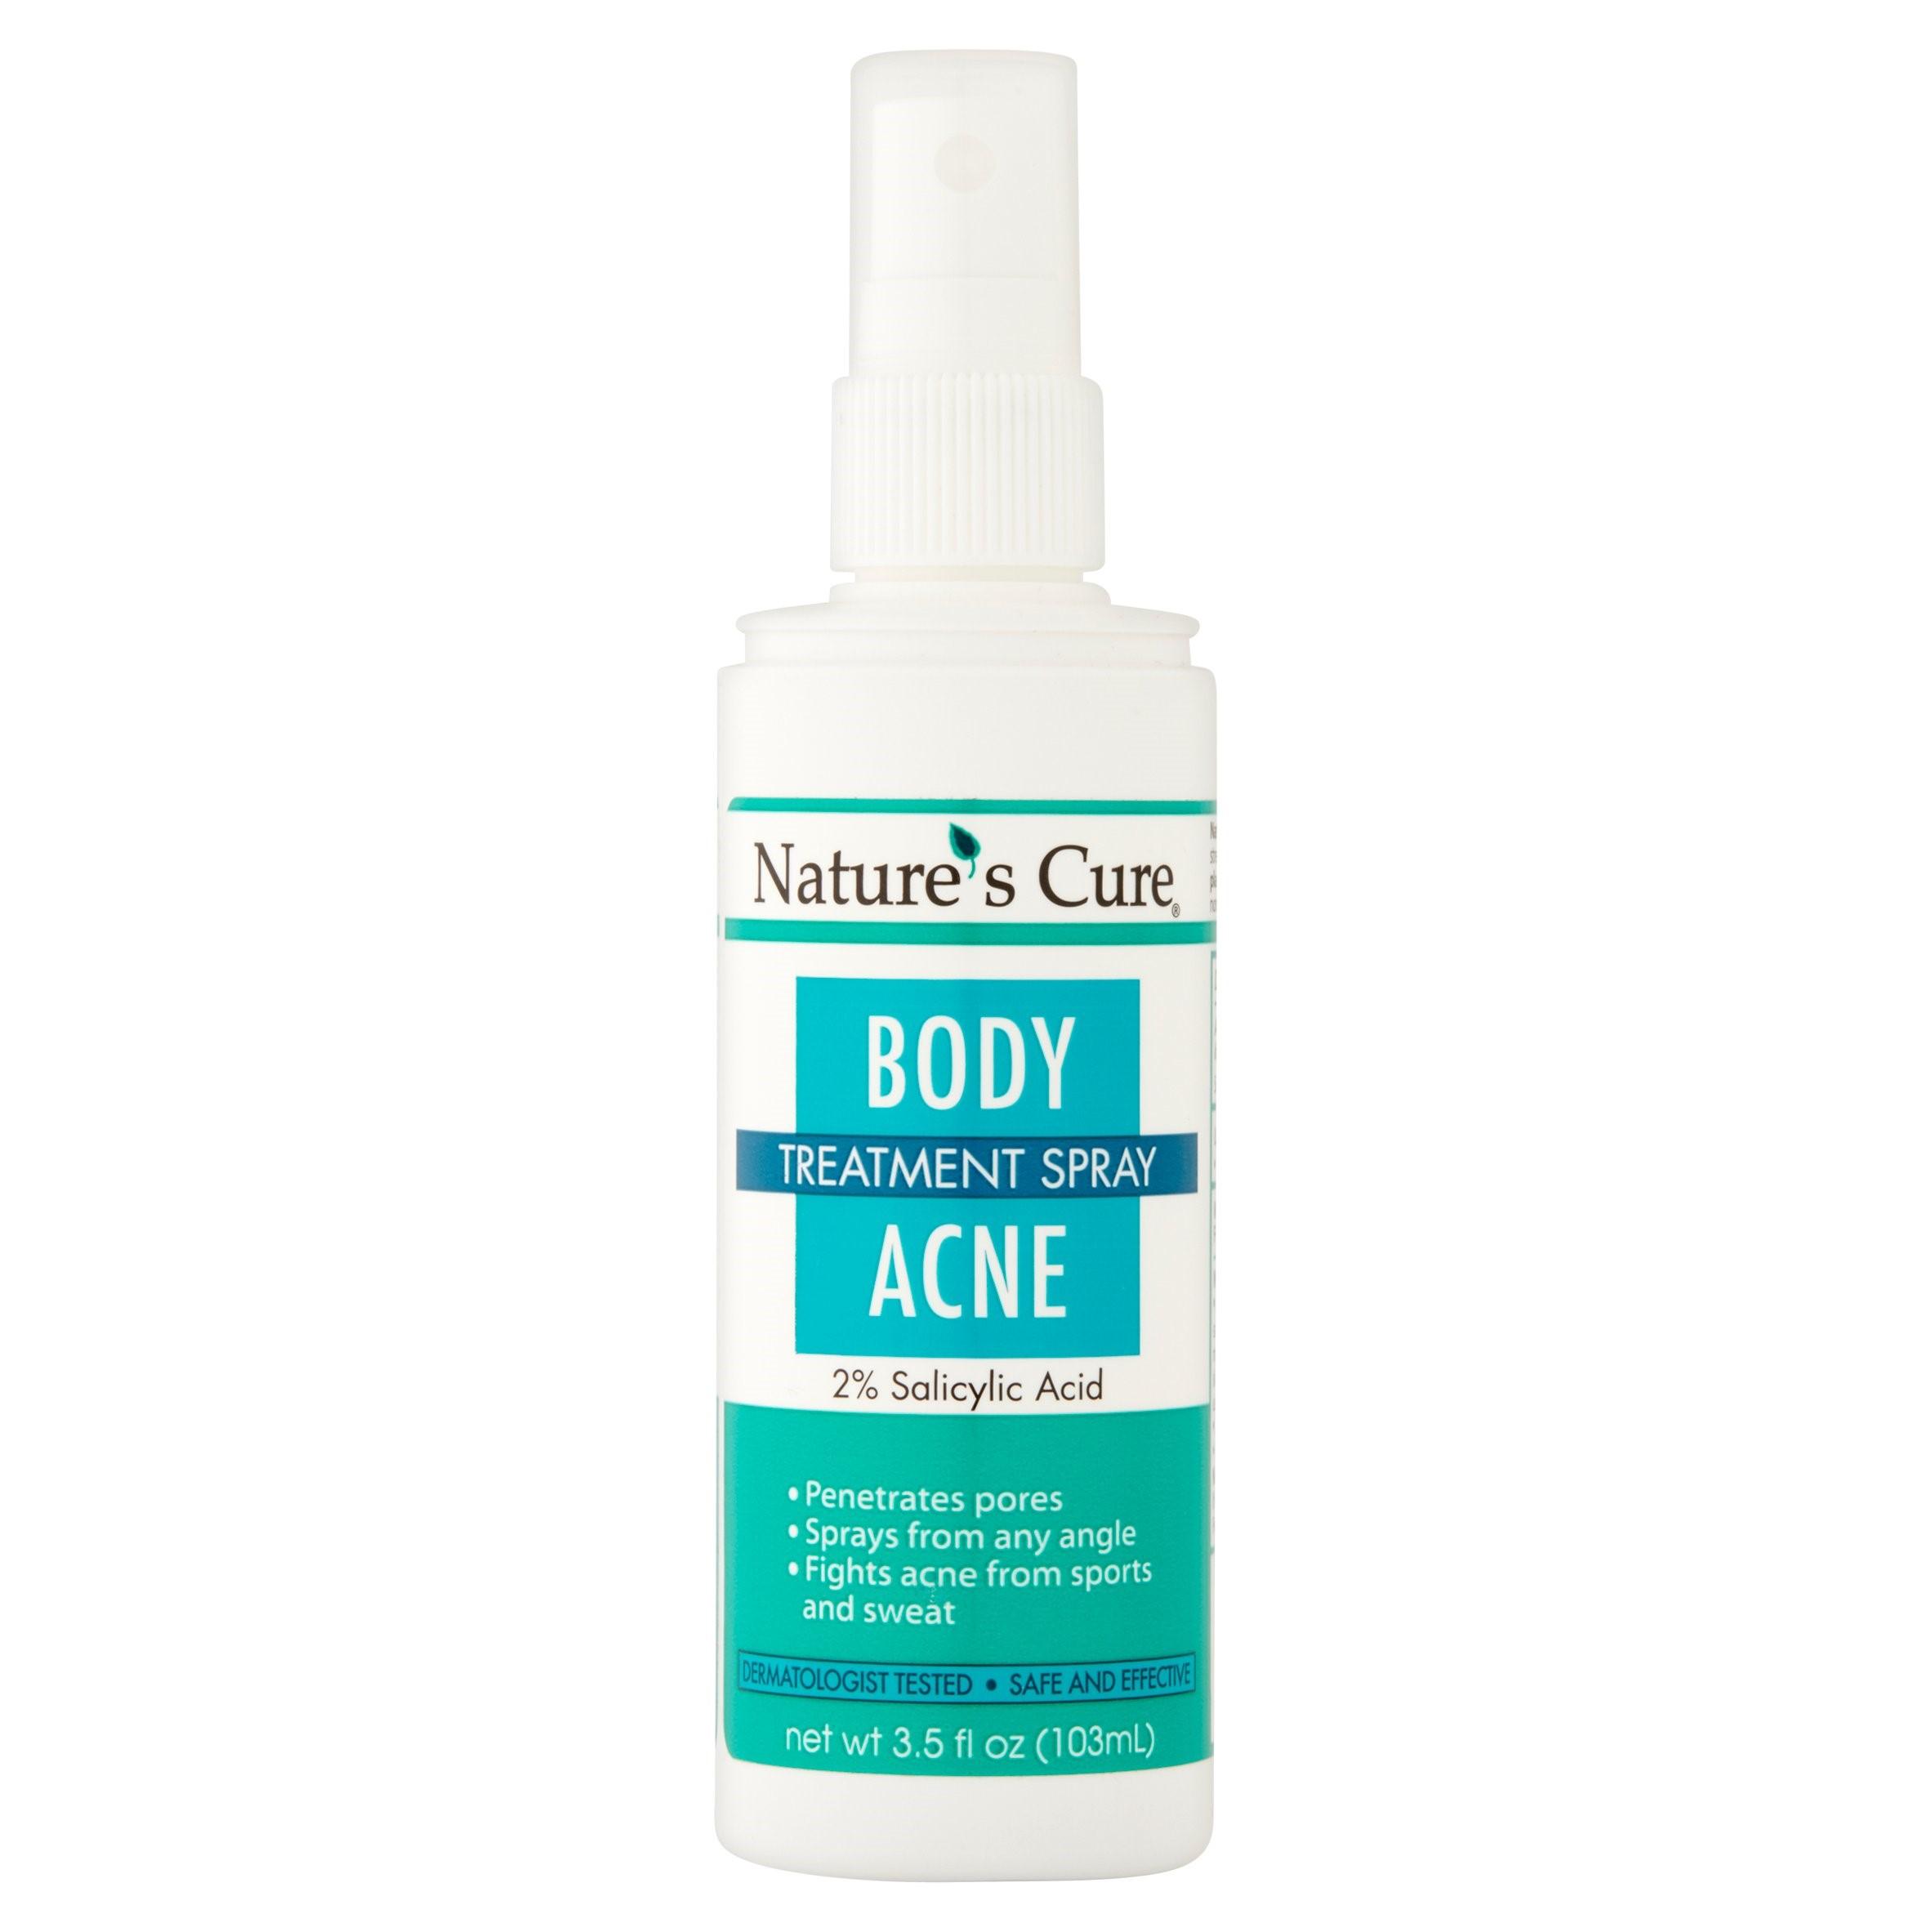 Nature's Cure Body Acne Treatment Spray, 3.5 fl oz